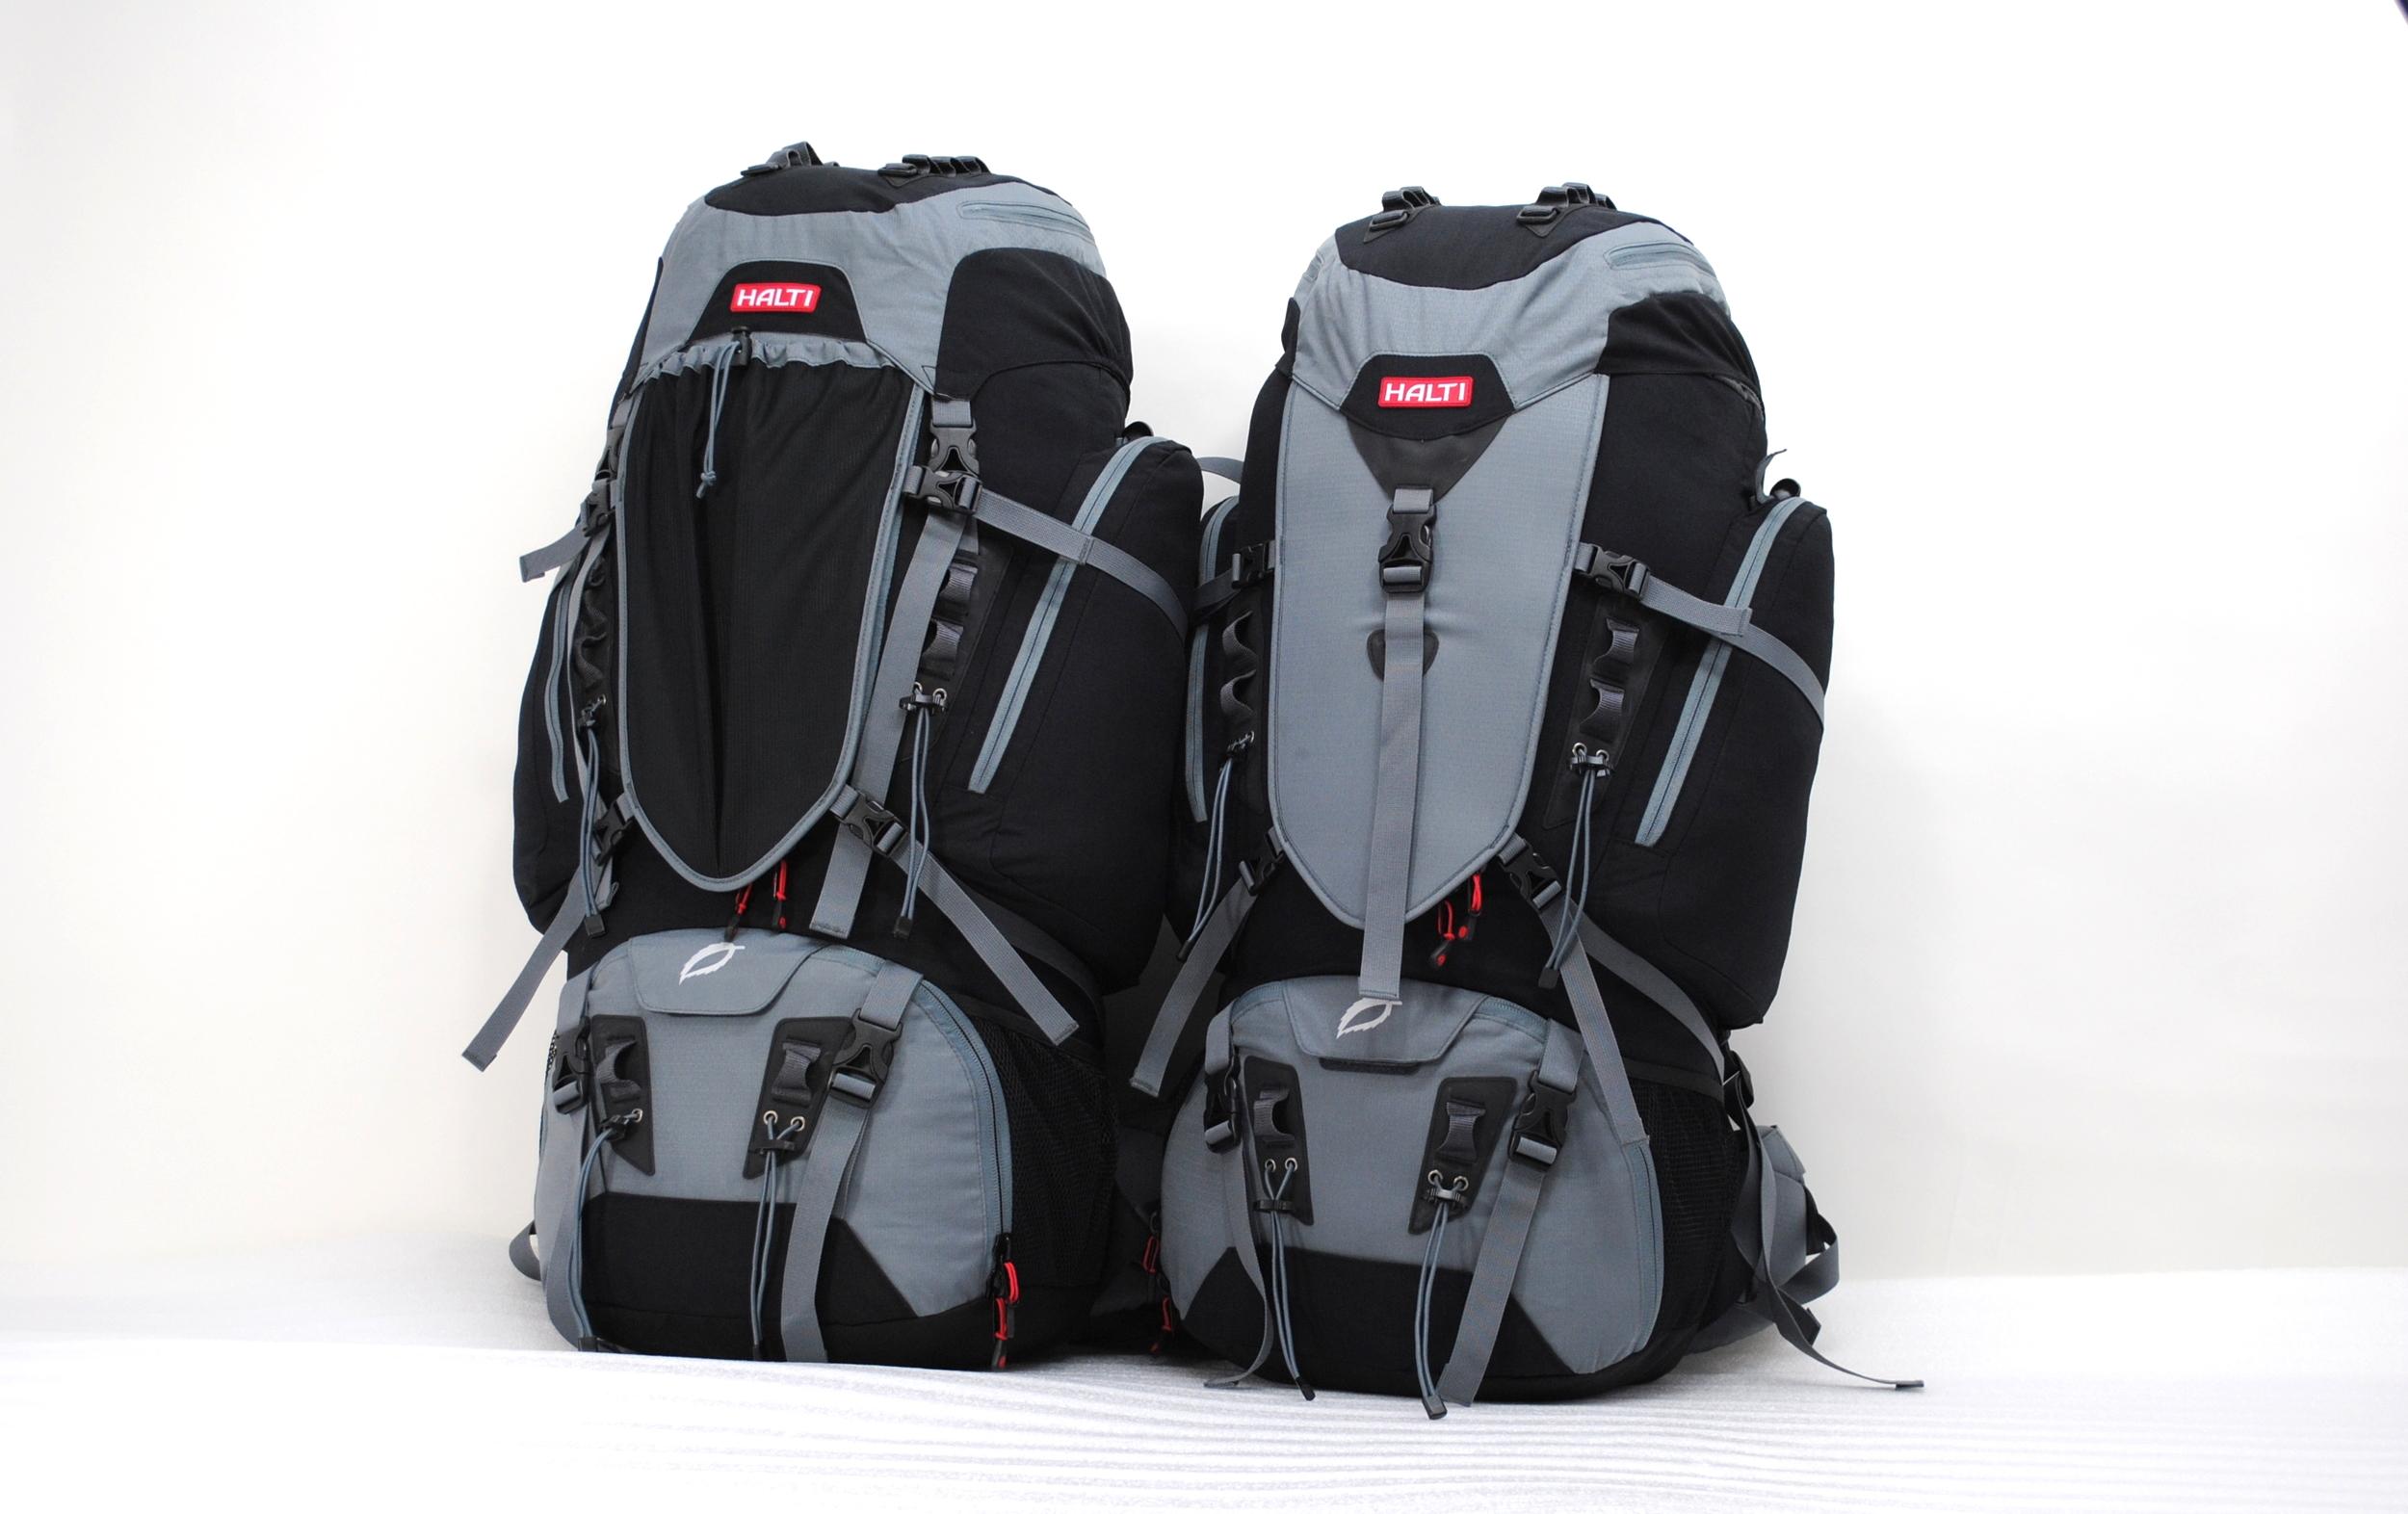 60 Liter Hiking Backpack